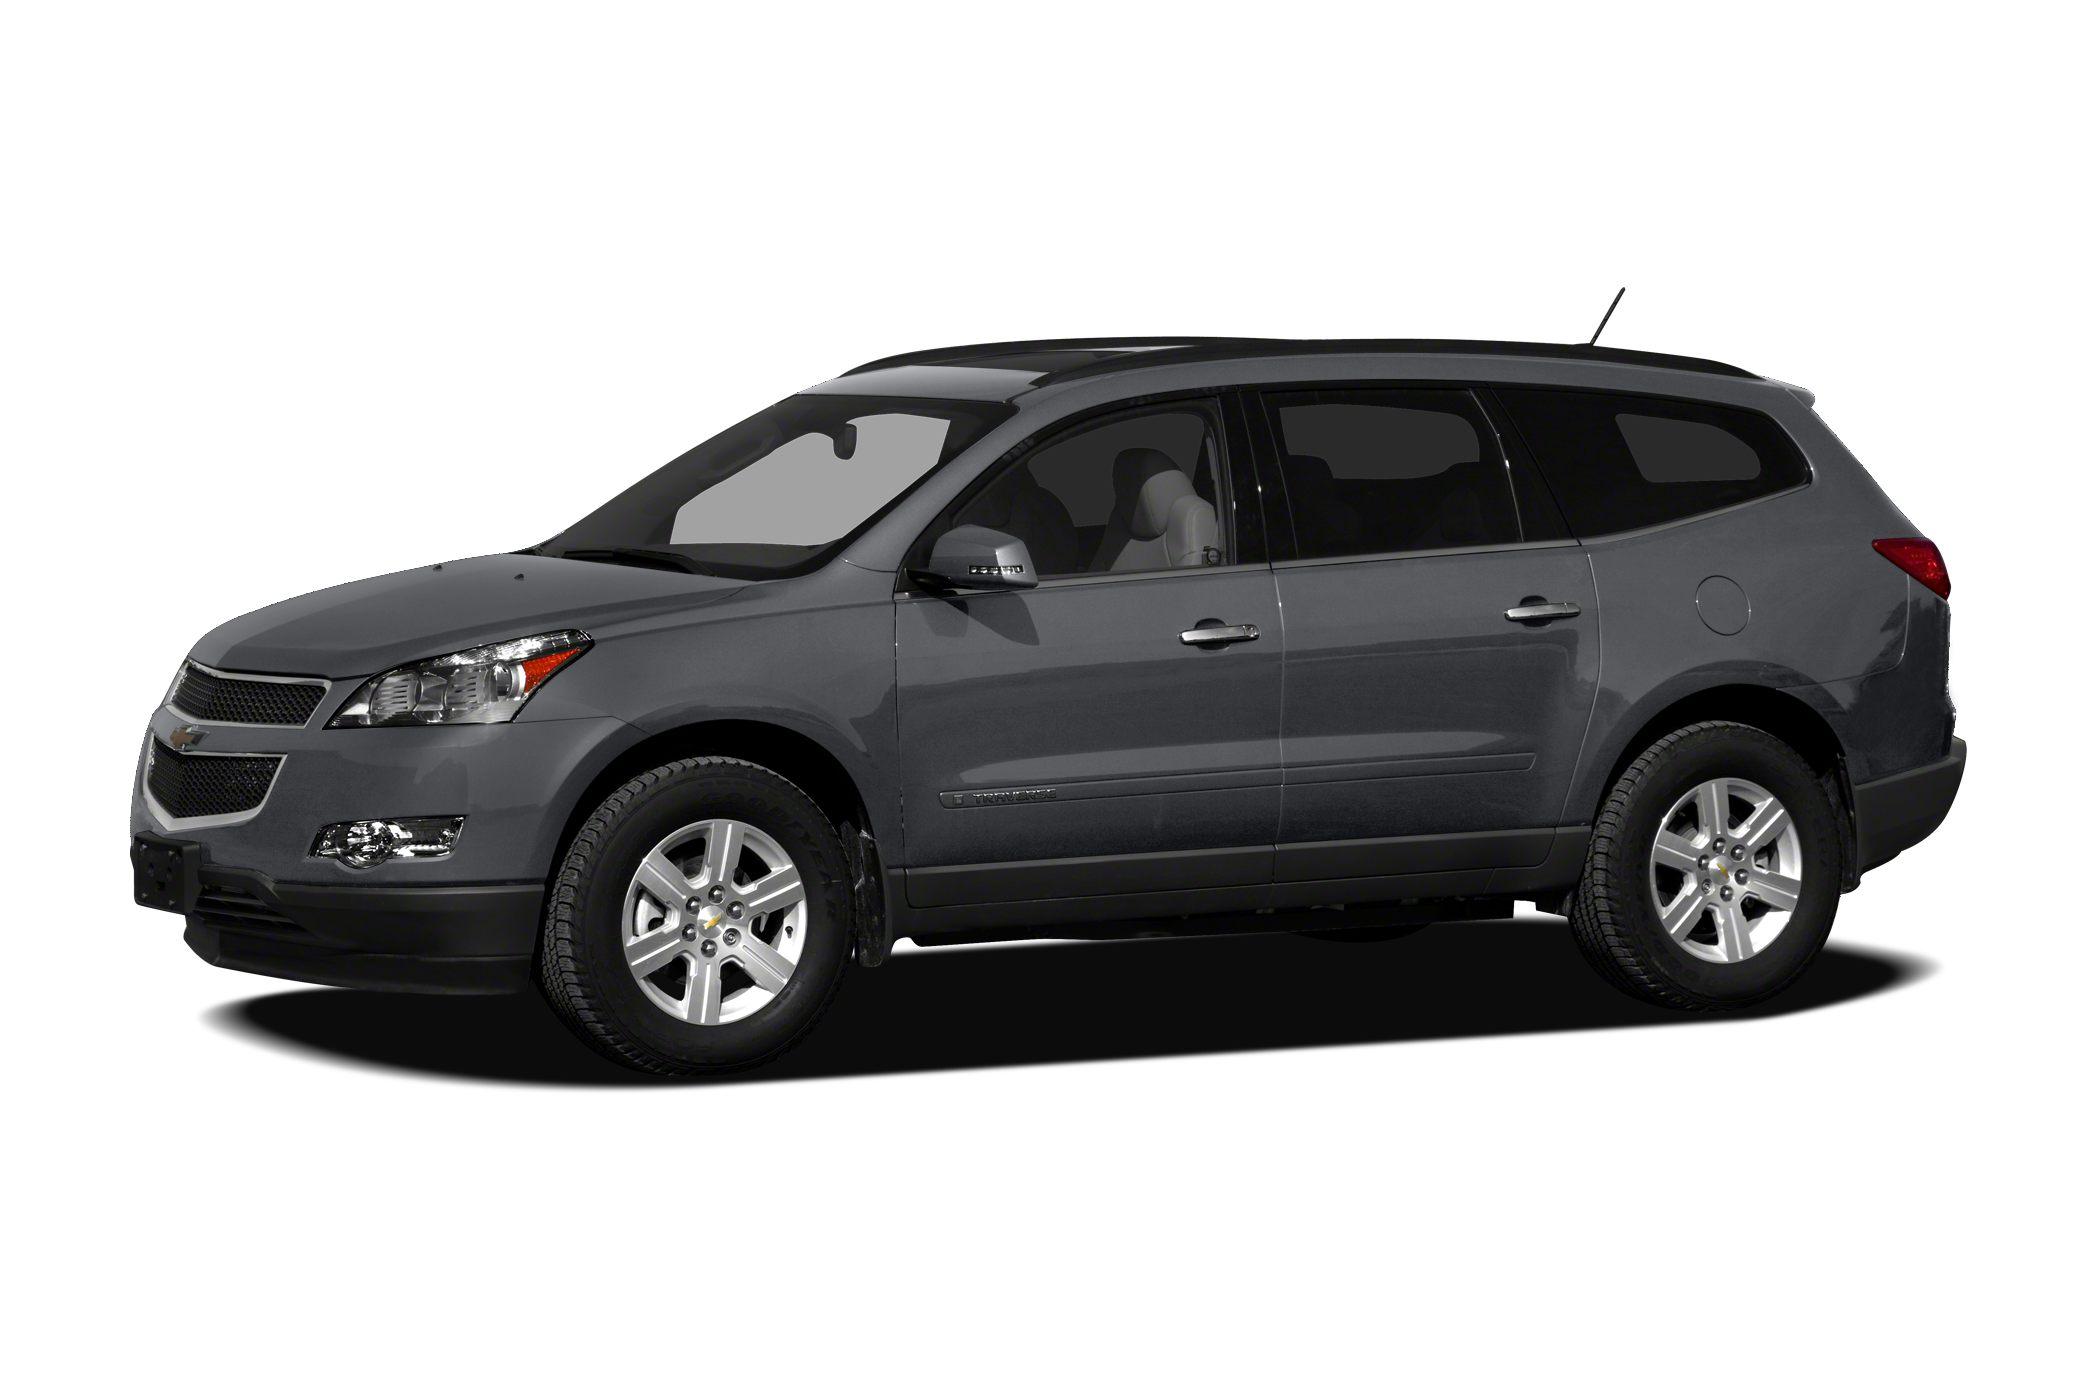 2011 Chevrolet Traverse Information